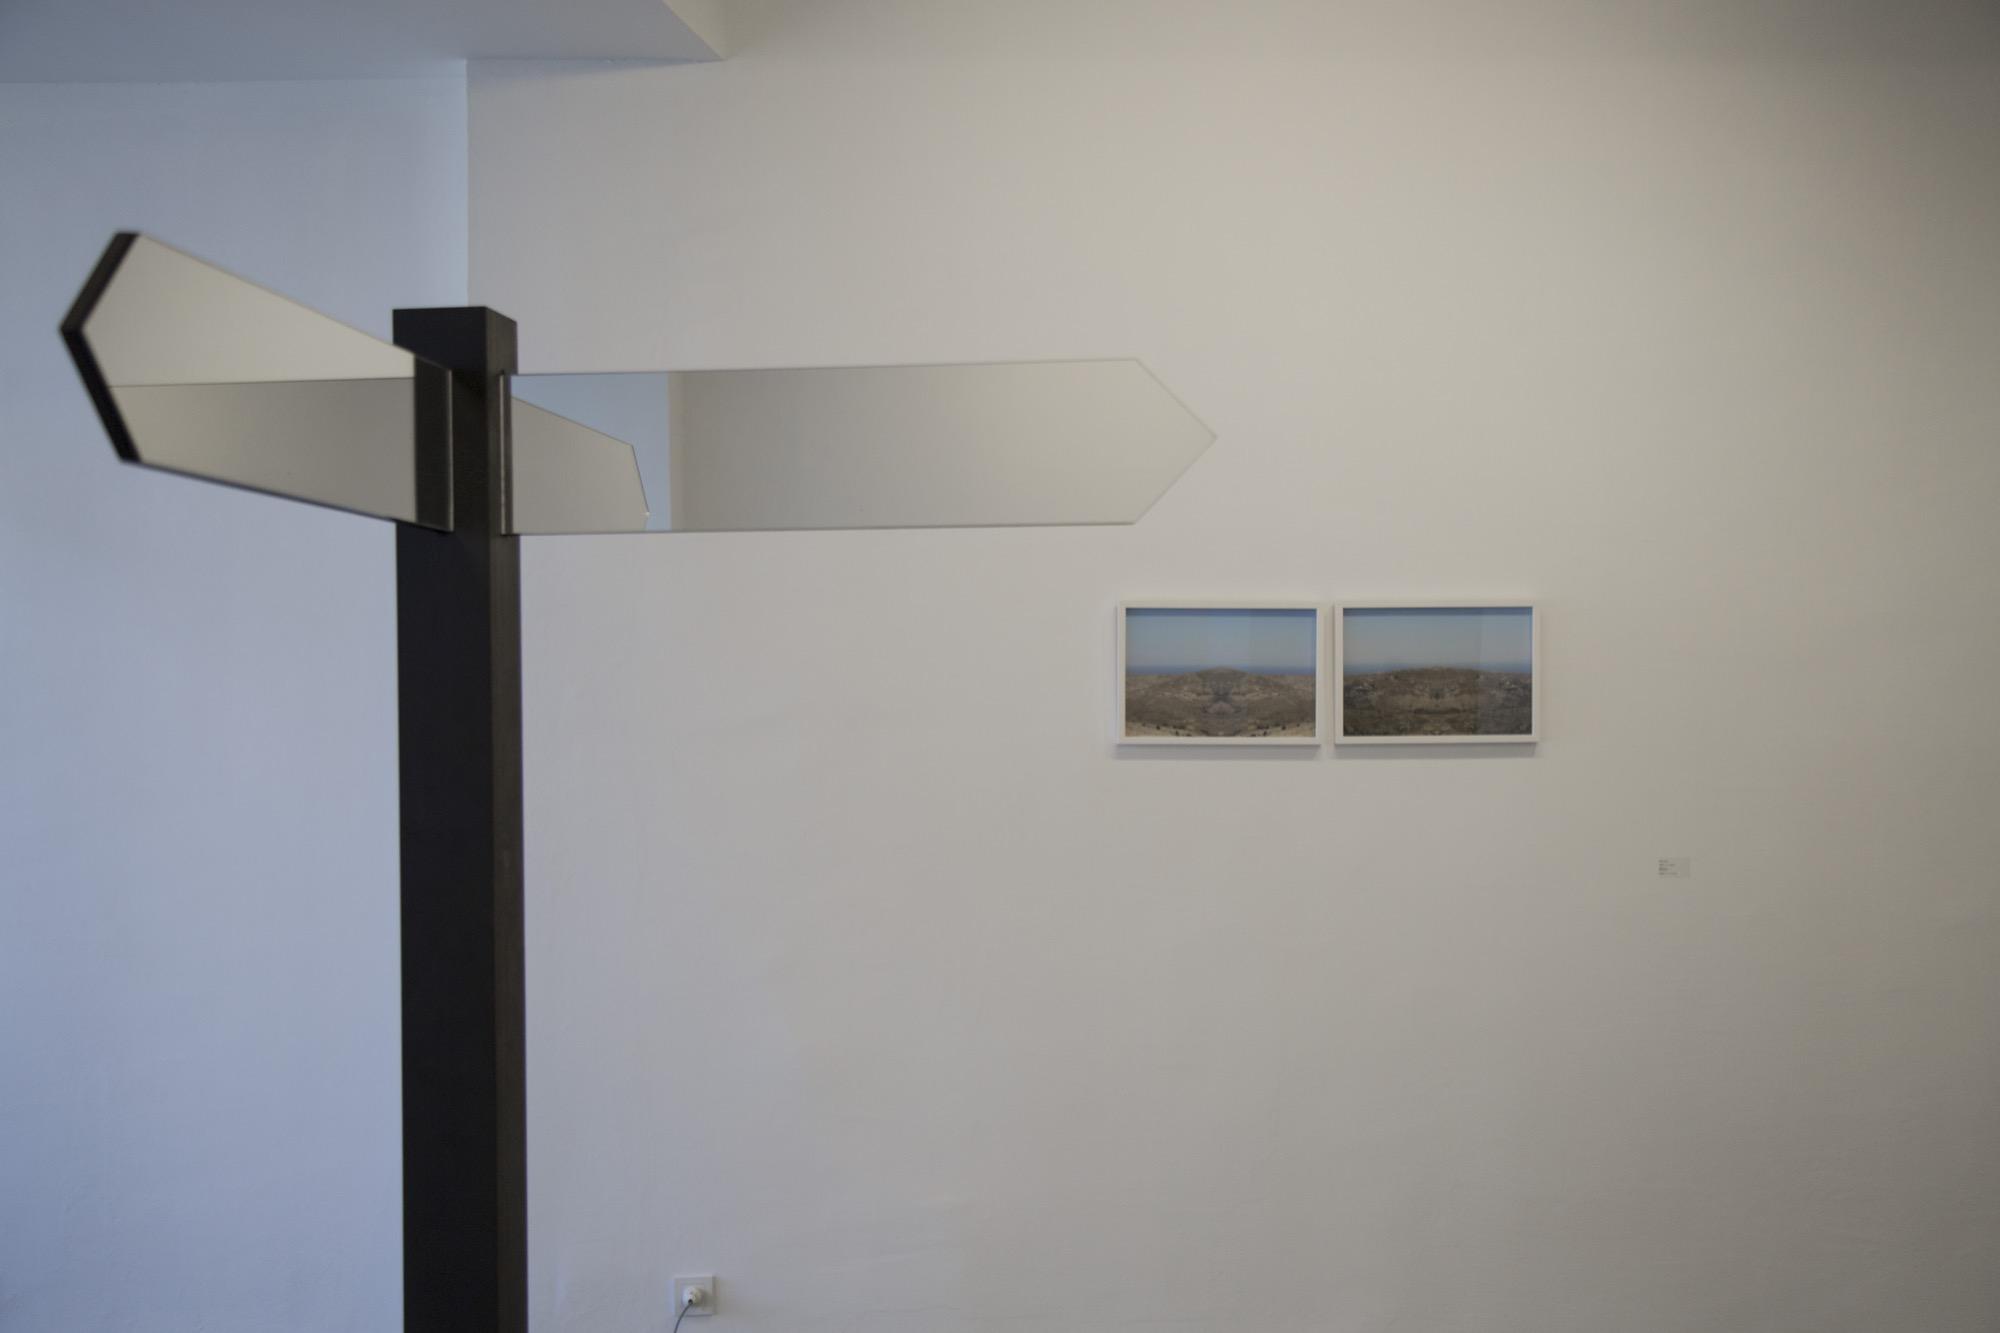 Nonlinear-Future-sergi-görselleri-lowres-09.jpg